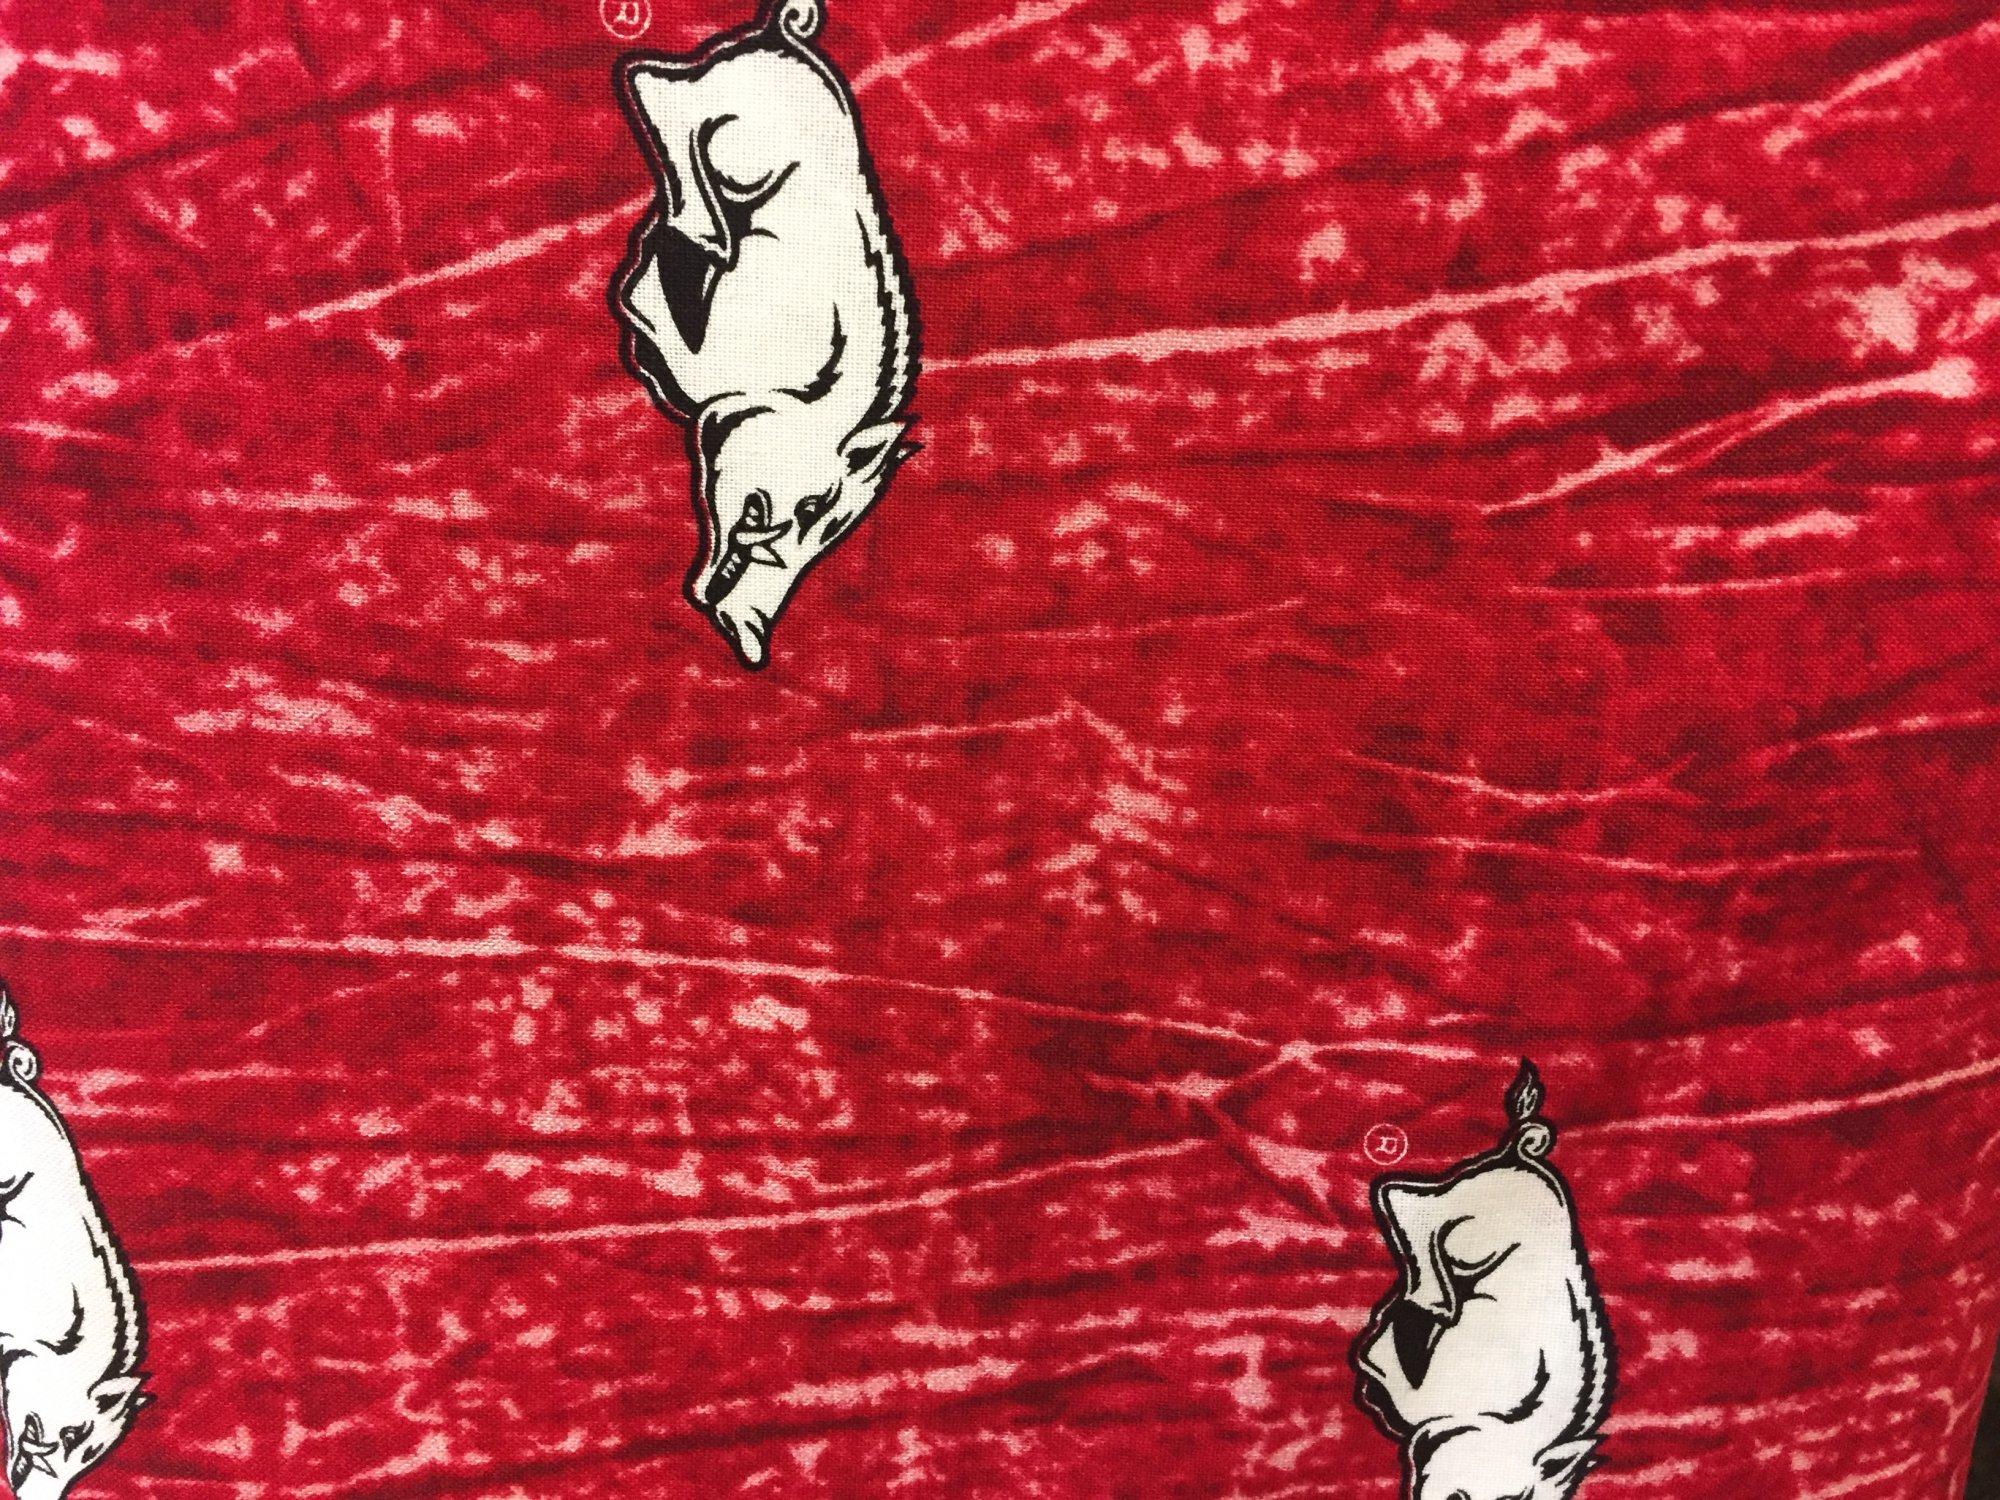 University of Arkansas Tie Dye Print Cotton